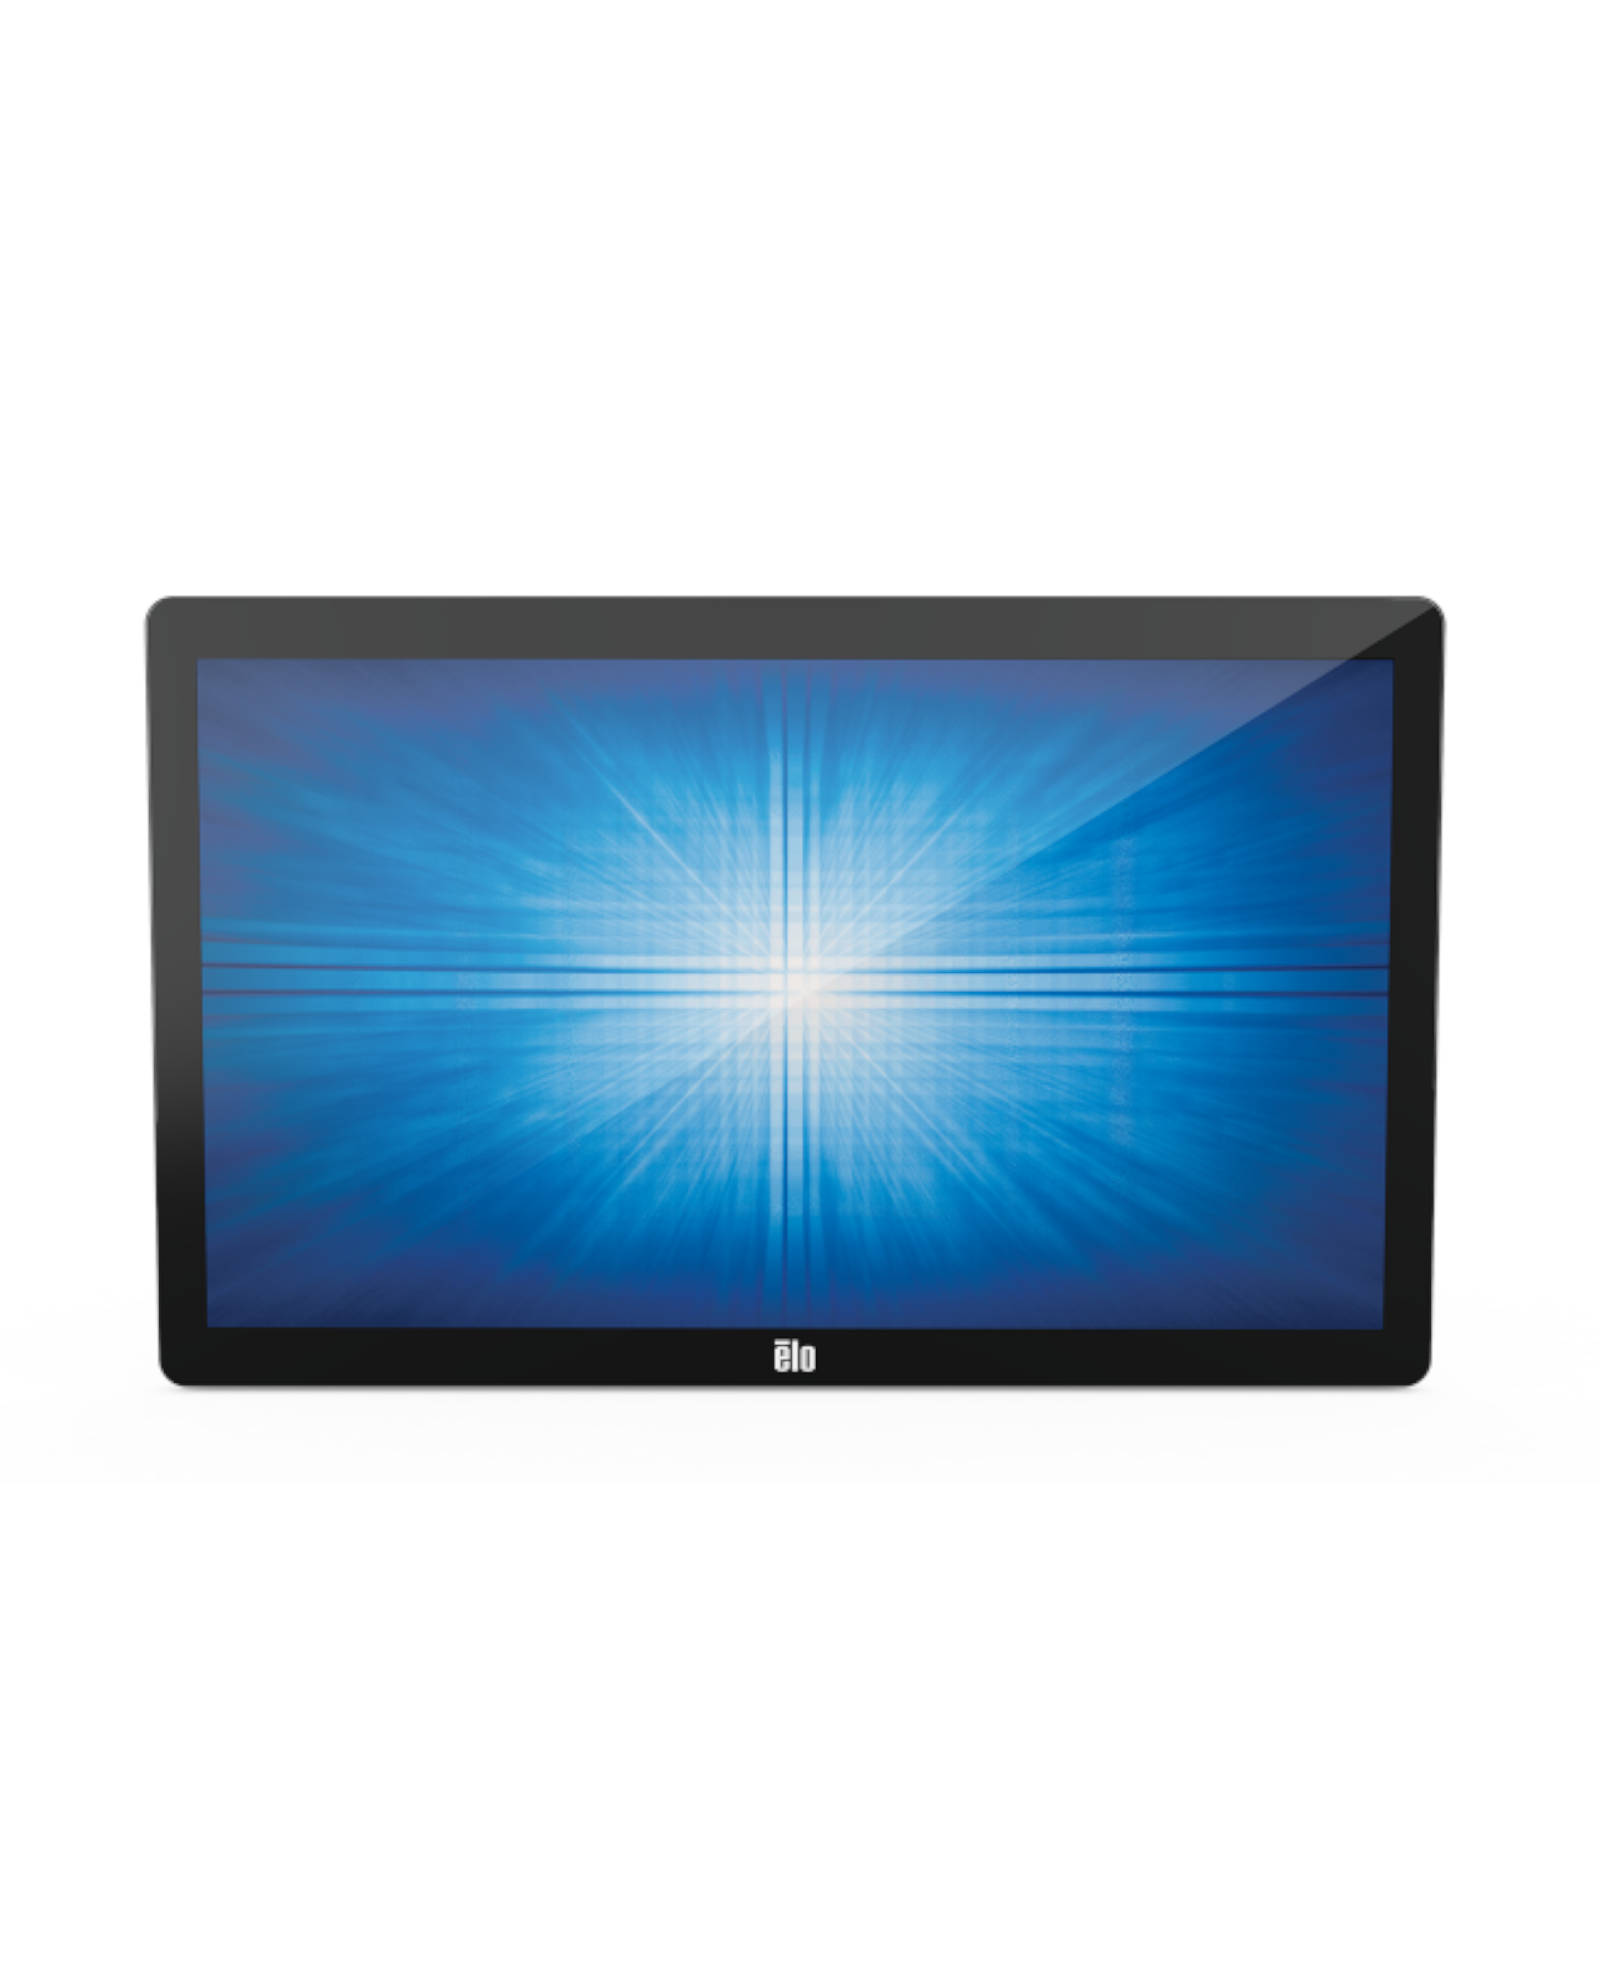 Elo 2202l 22inch Touchscreen Monitor4